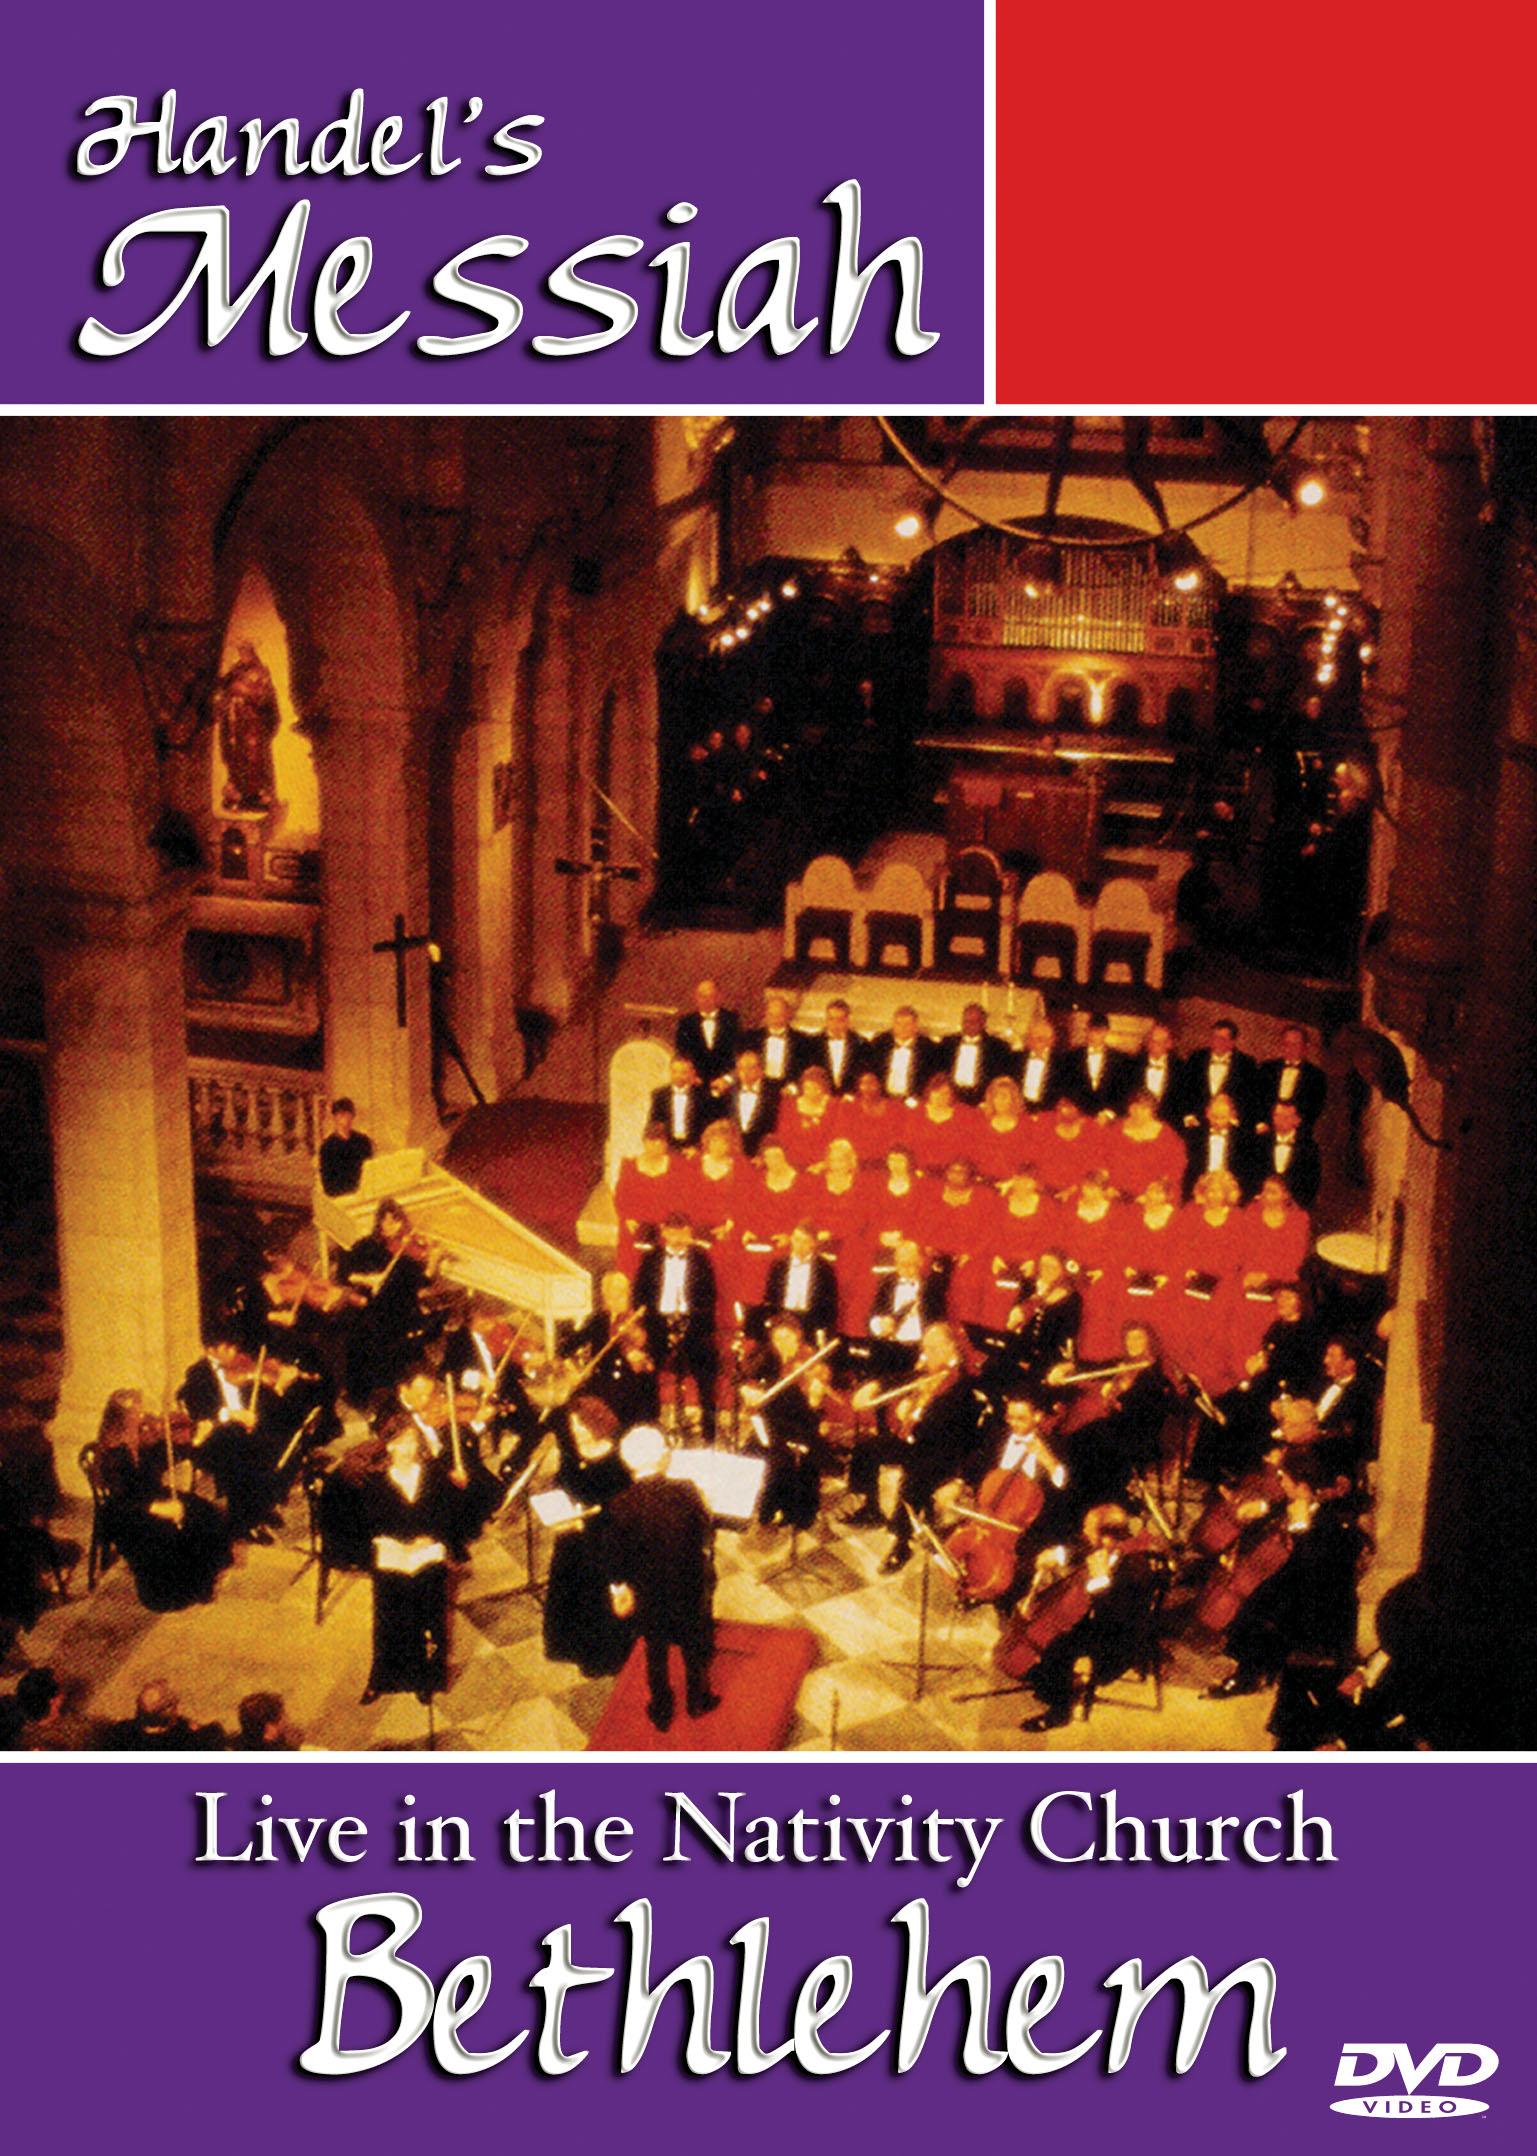 Handel's Messiah: Live in Nativity Church - Bethlehem